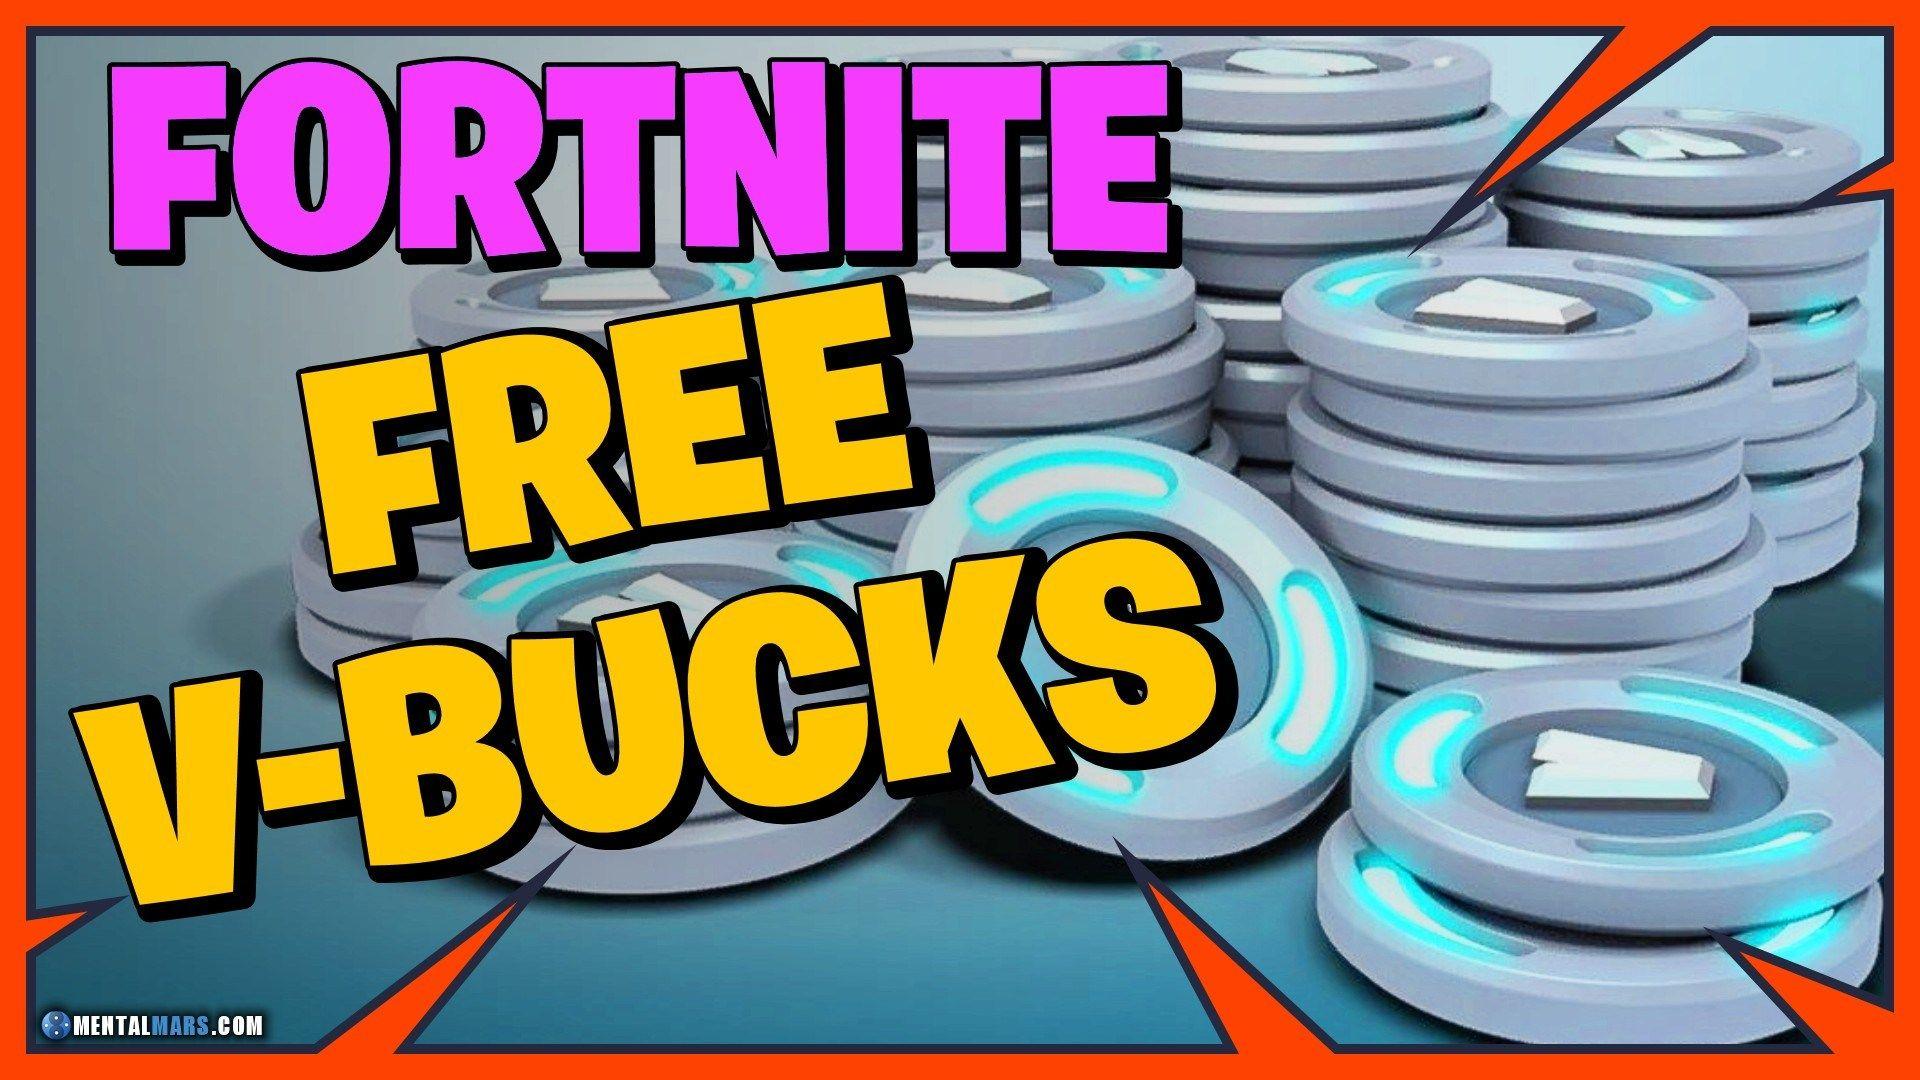 How to get free vbucks fortnite no human verification